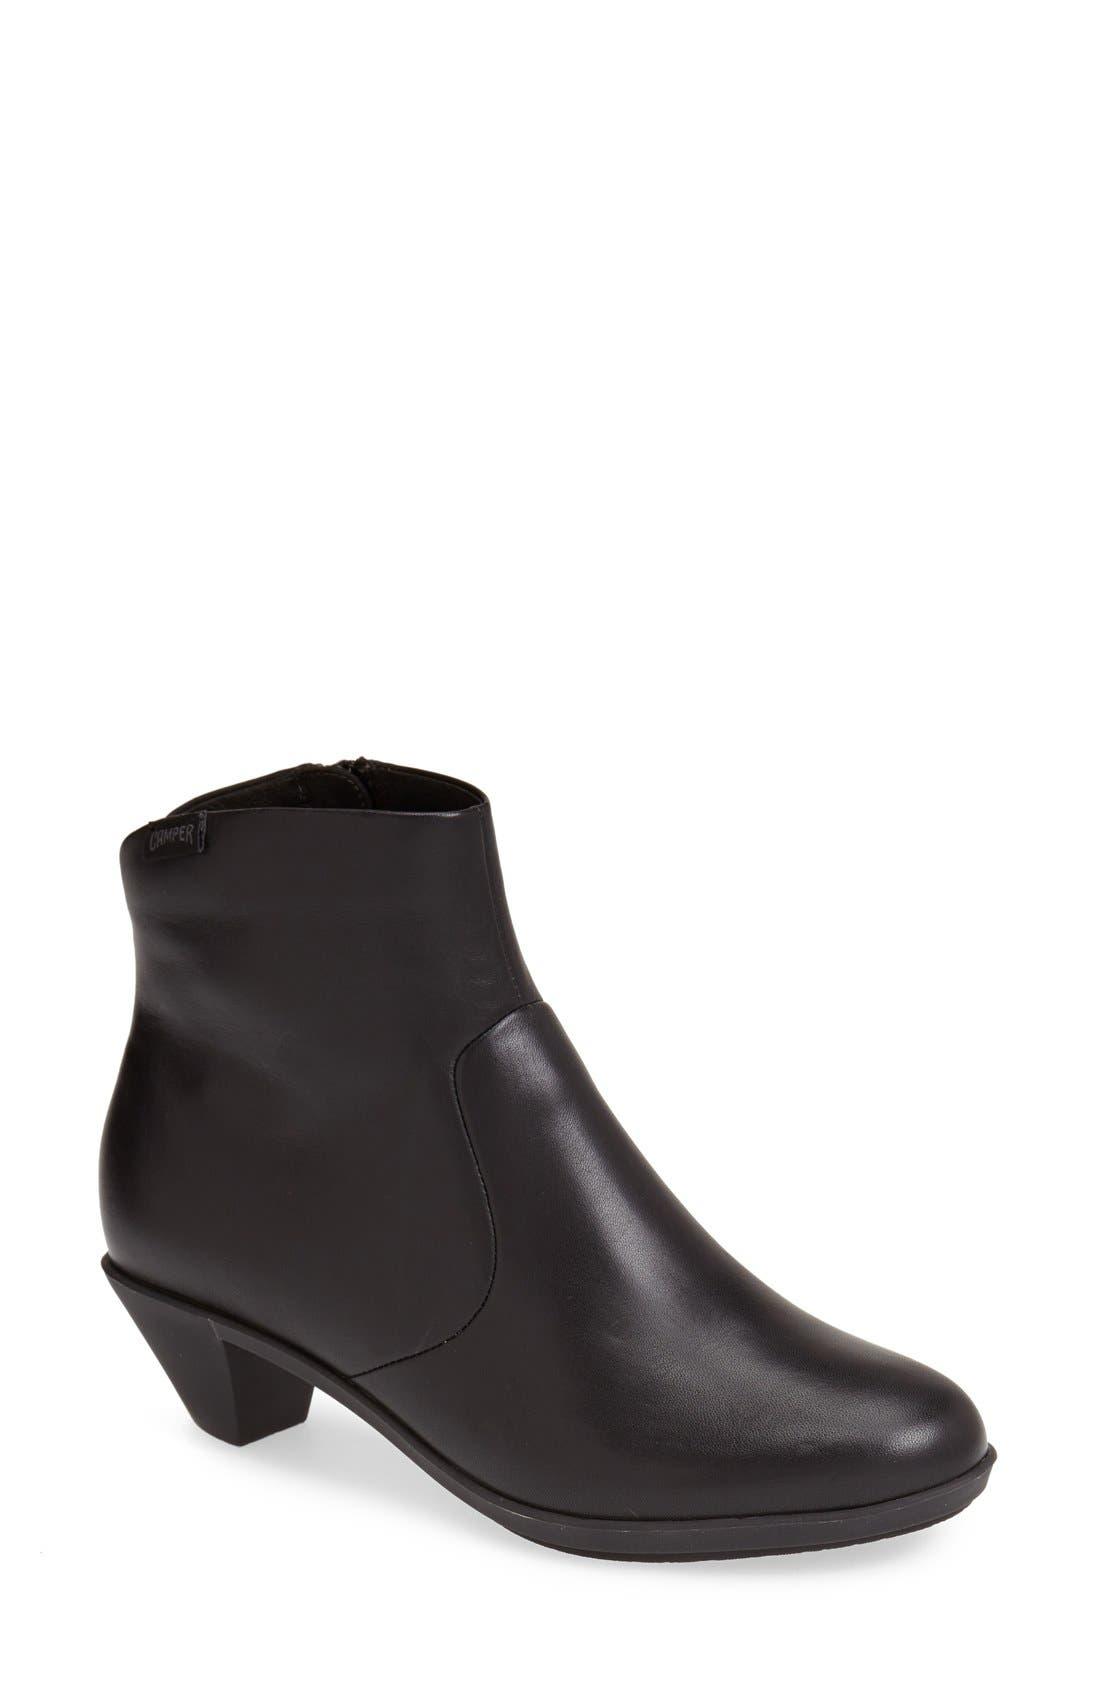 'Agatha' Ankle Boot,                             Main thumbnail 1, color,                             001